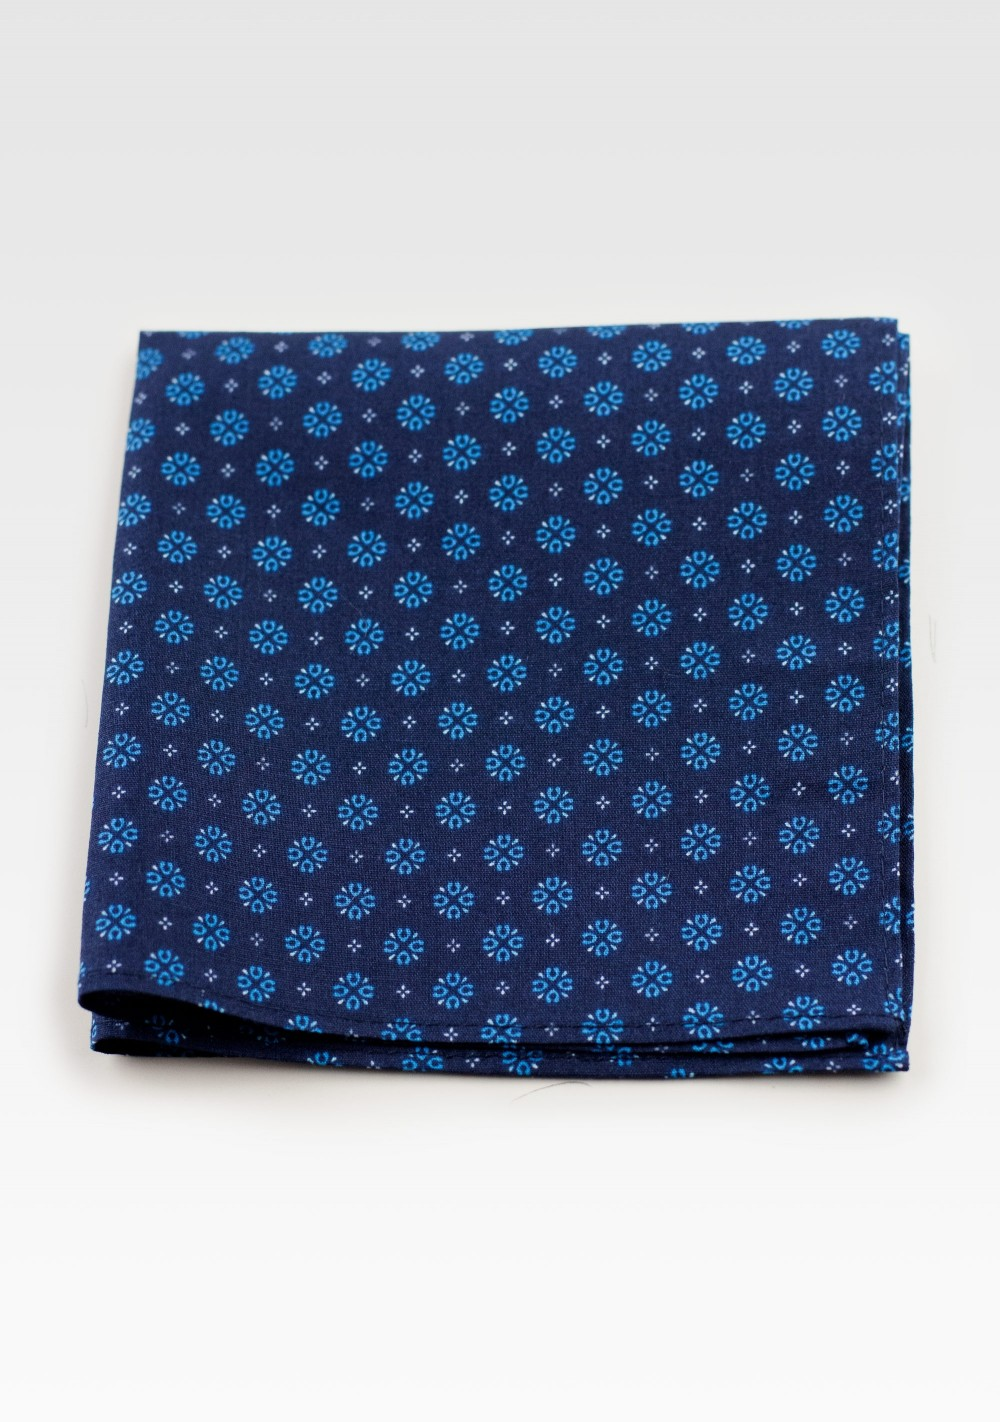 Geometric Print Cotton Pocket Square in Navy & Blues